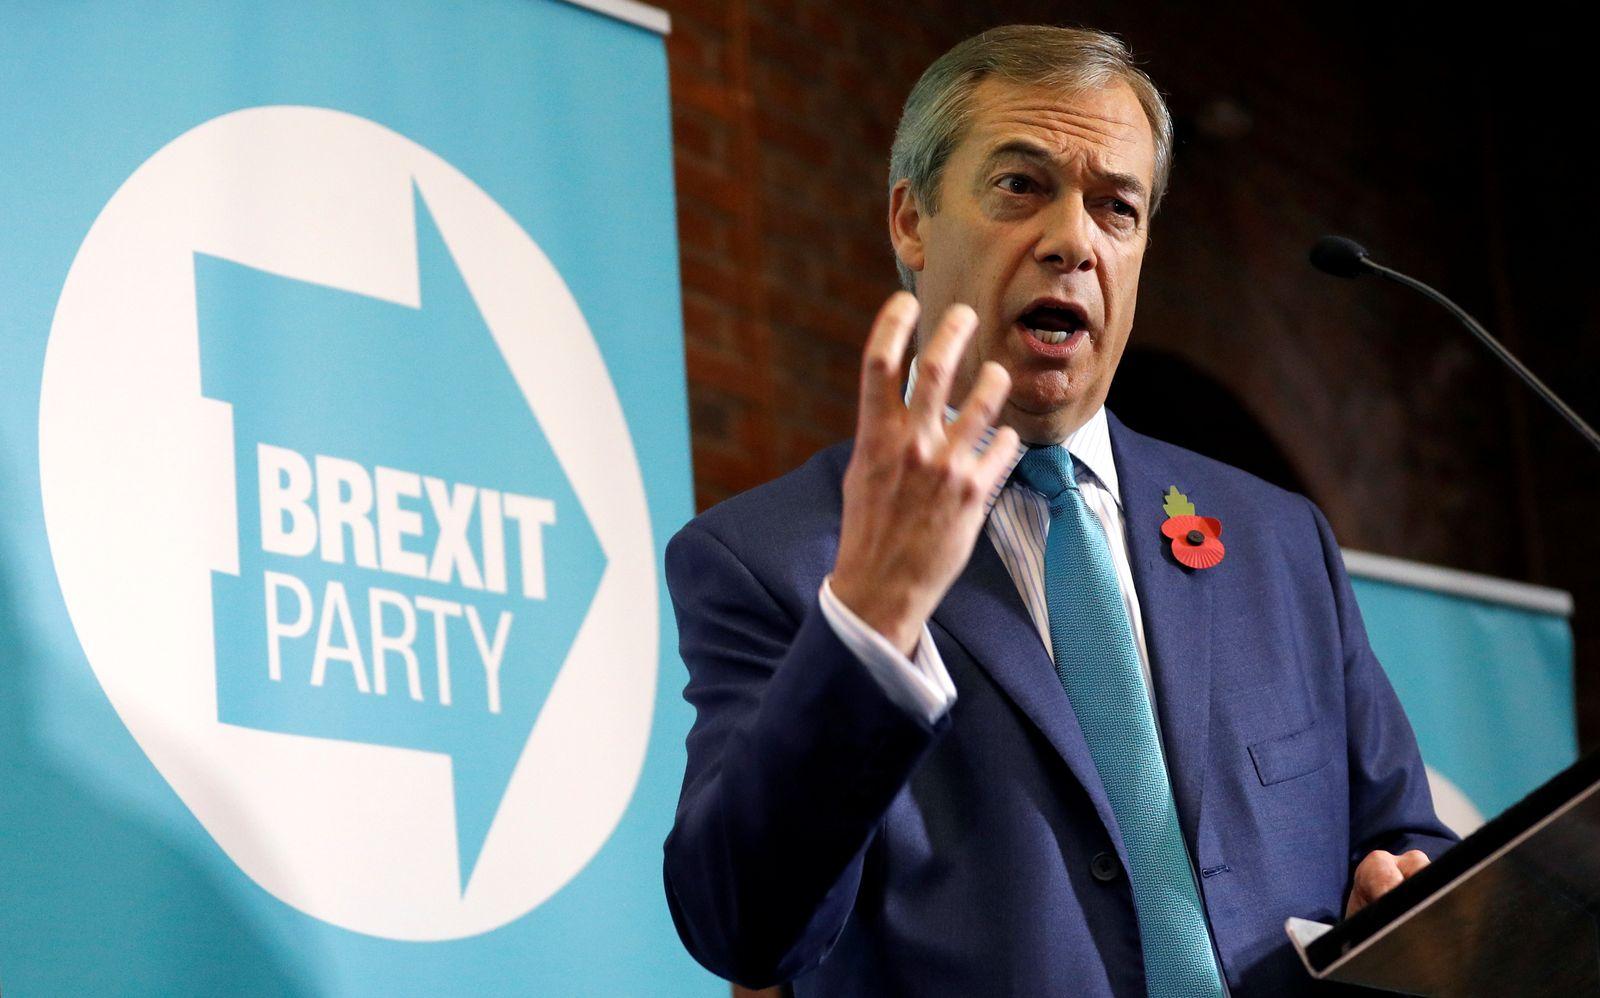 BRITAIN-ELECTION/BREXIT PARTY